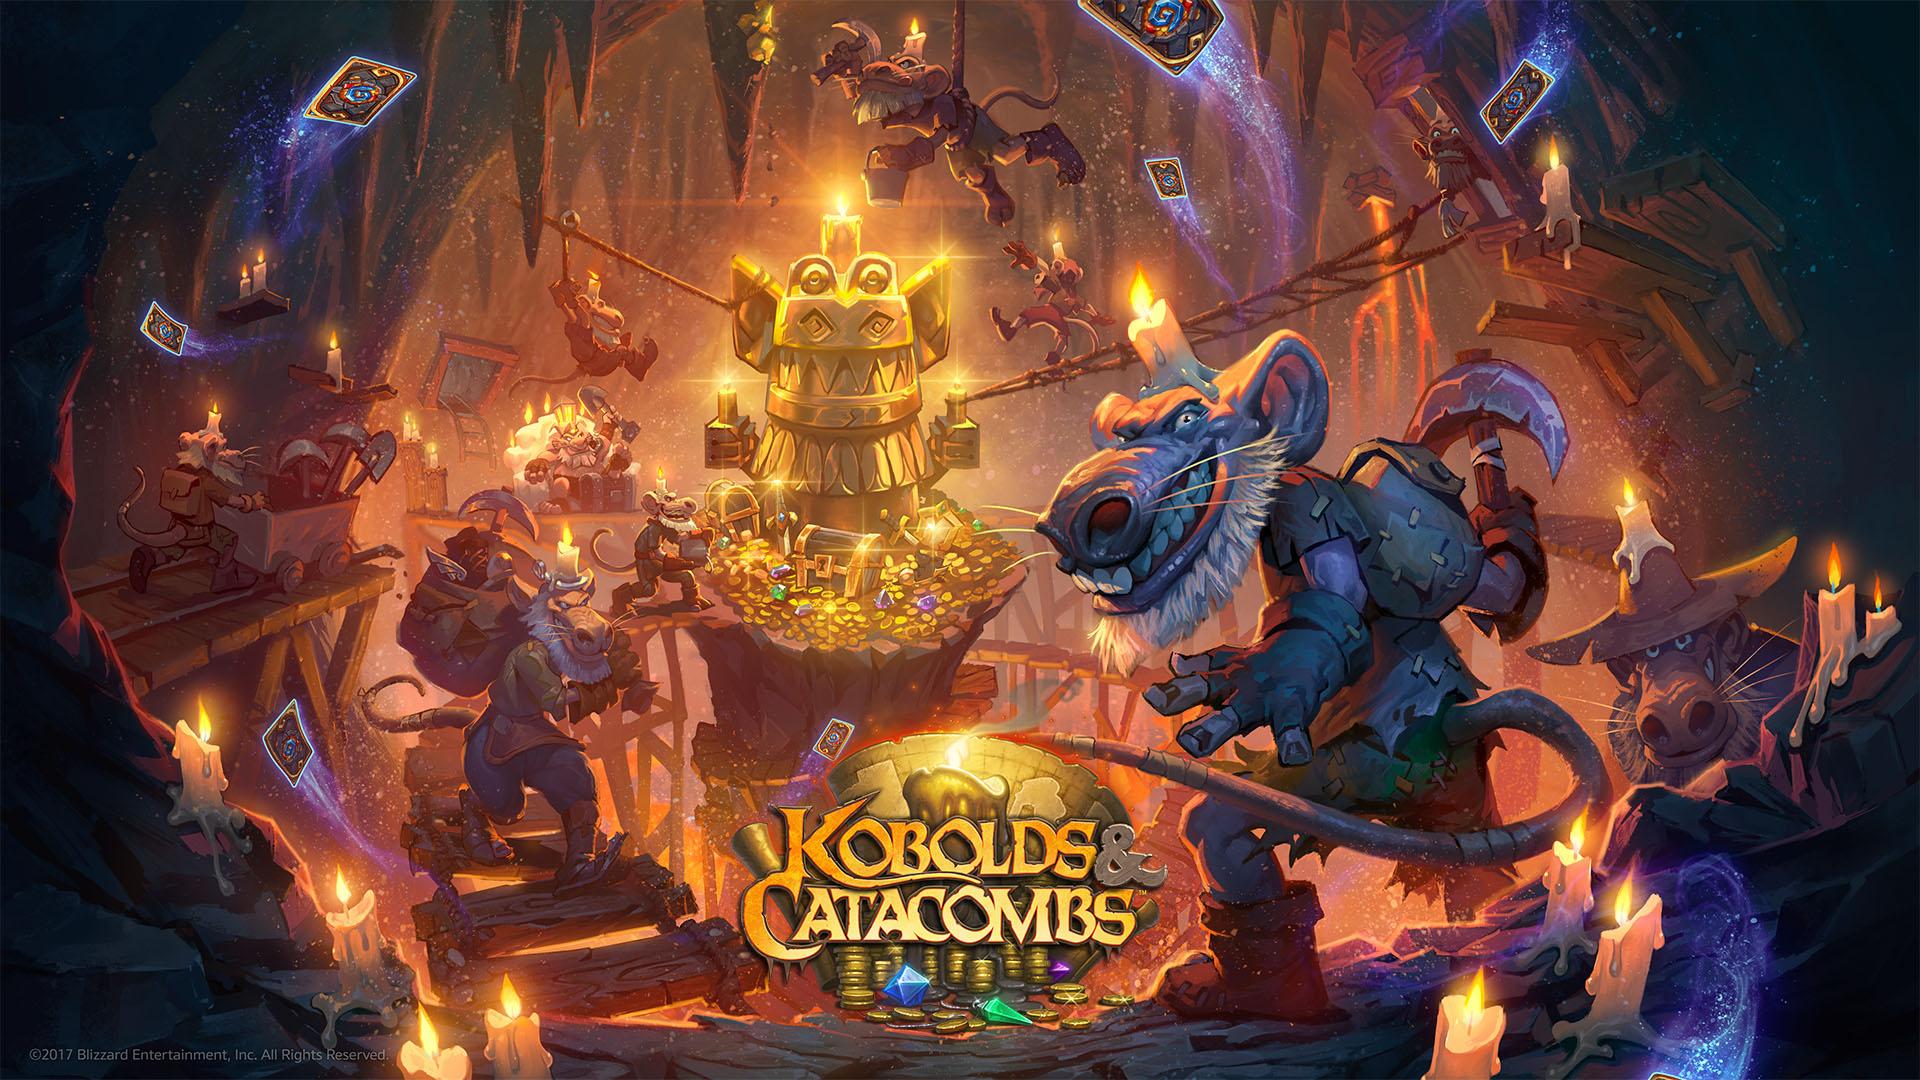 kobolds-and-catacombs_wallpaper1920x1080-11246edf74dde5f33f9e987c333ca531d3555bf5487dc054174daa545ca11ba6941c6440fcd4b0af386577d276862e9744bf8cfa9cdef837d0279a9321d76414.jpg